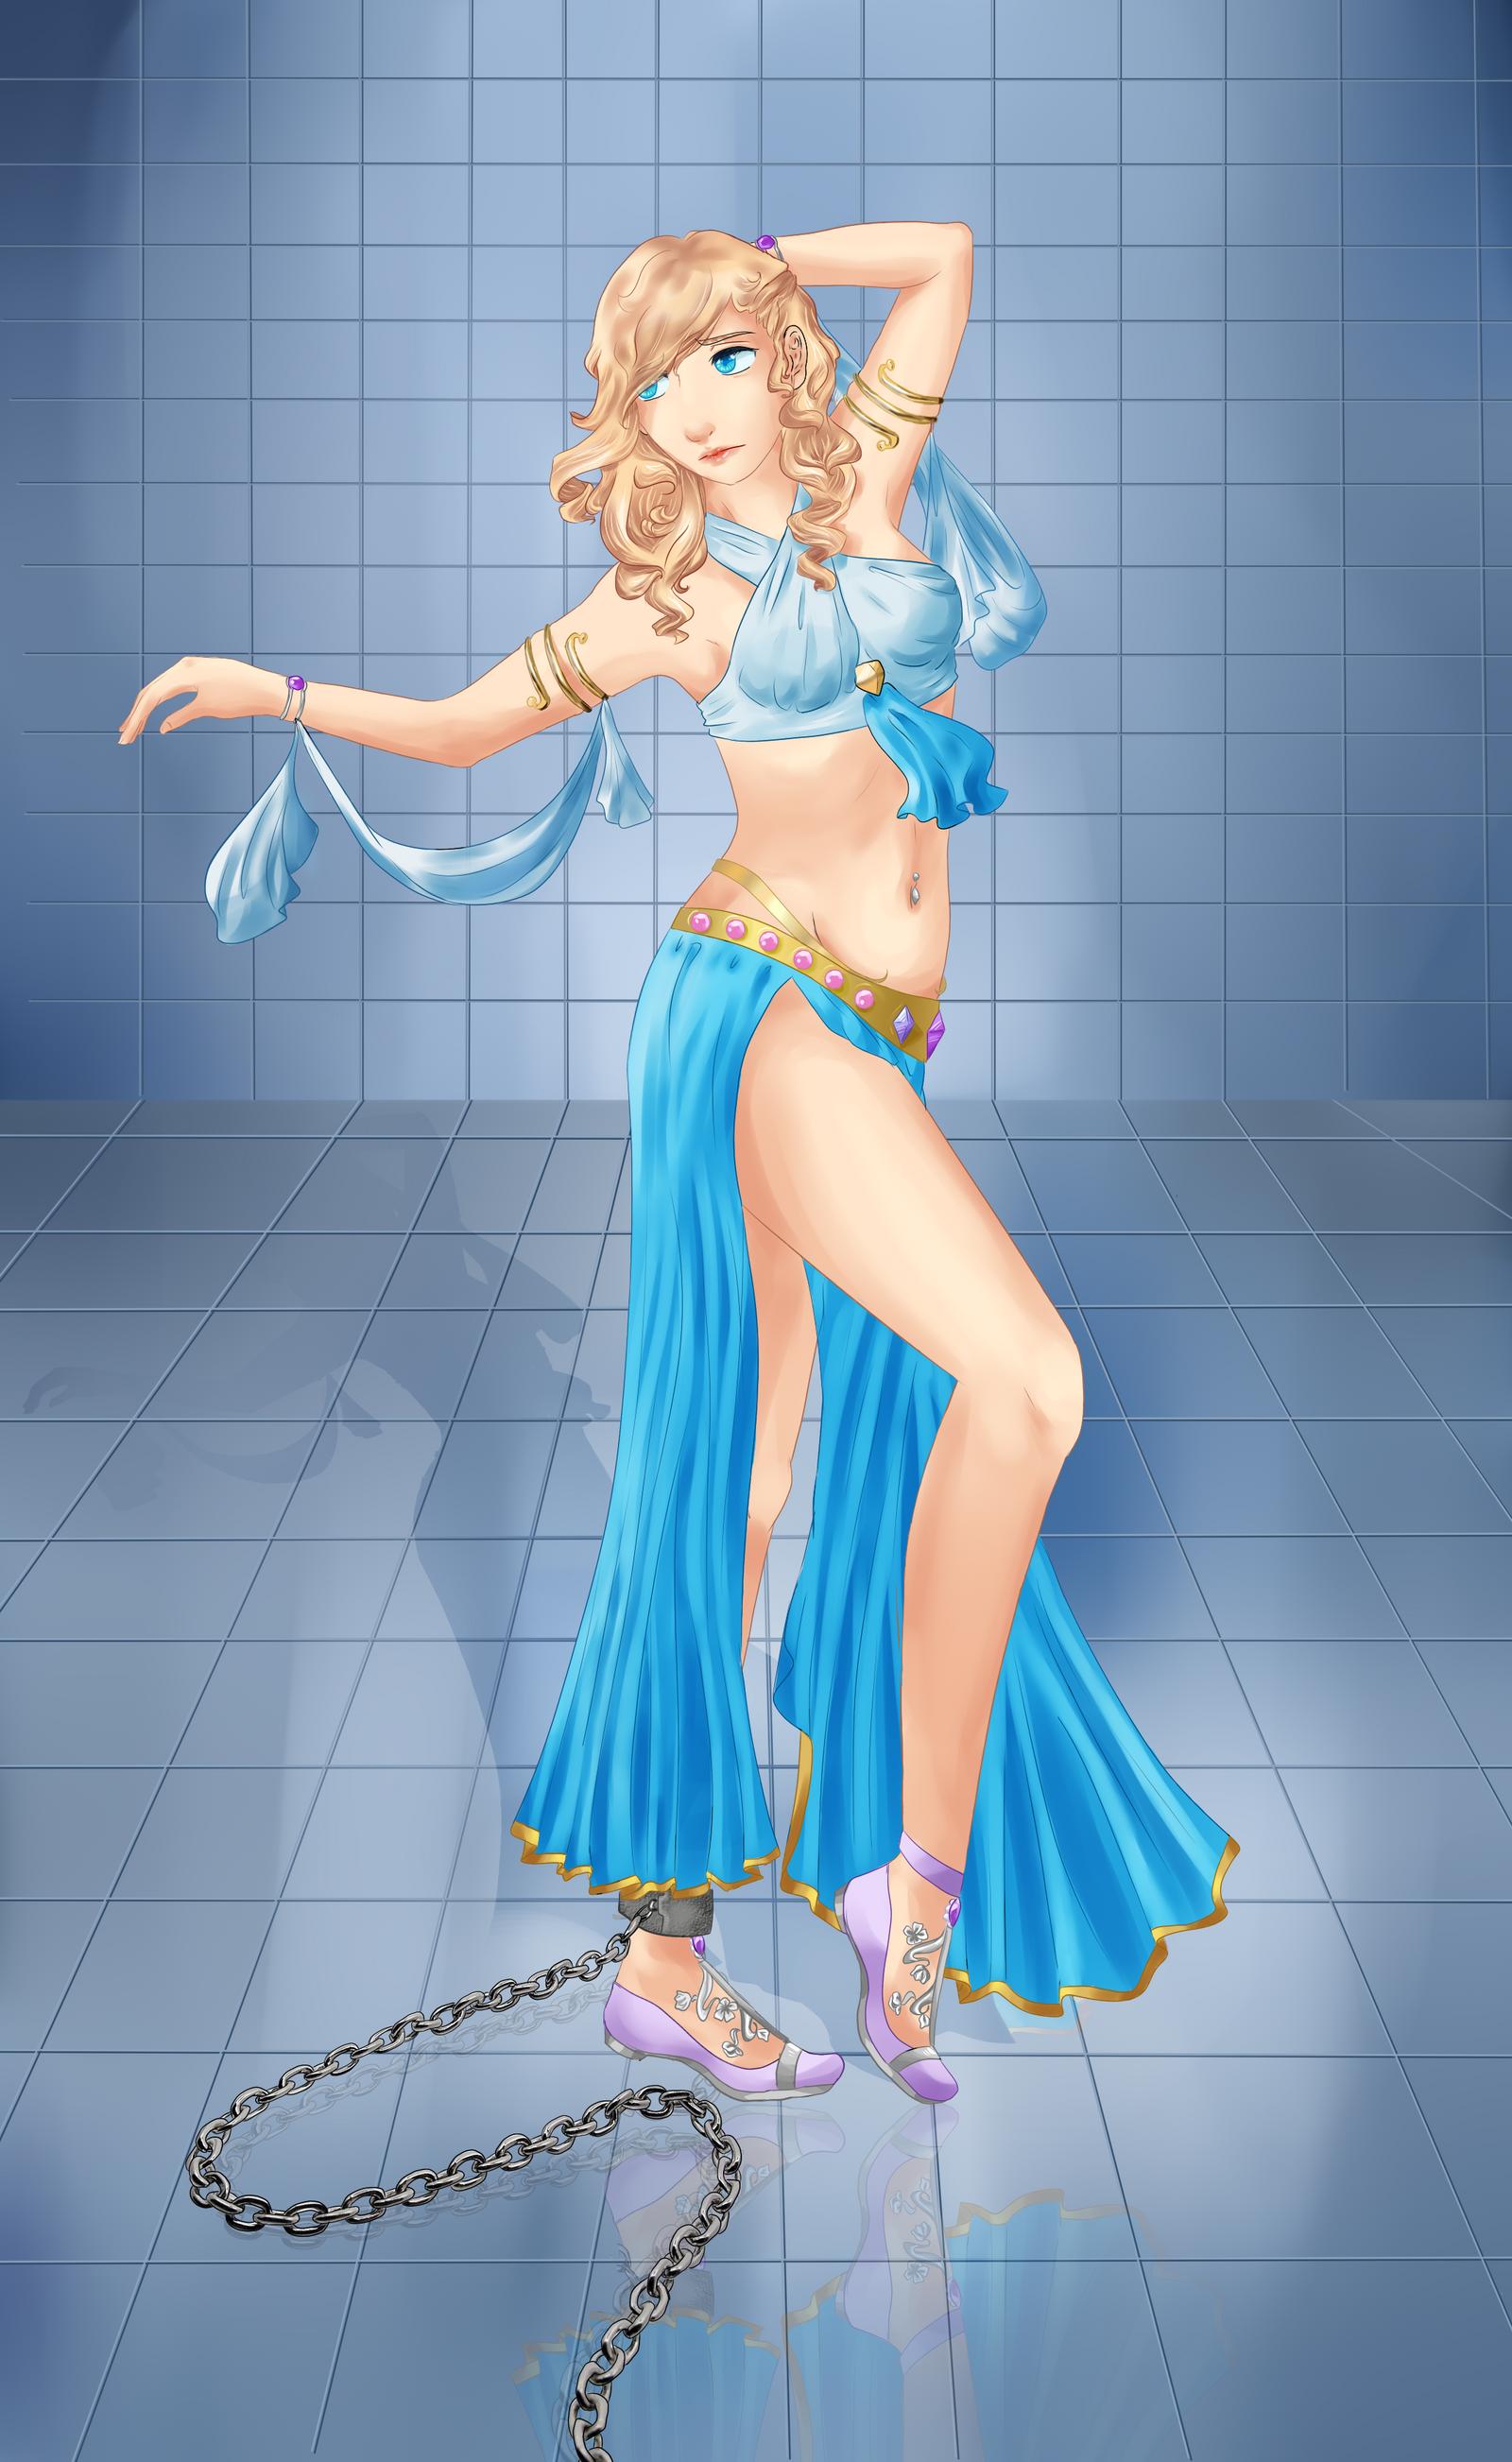 Babe nice anime bikini dancers add